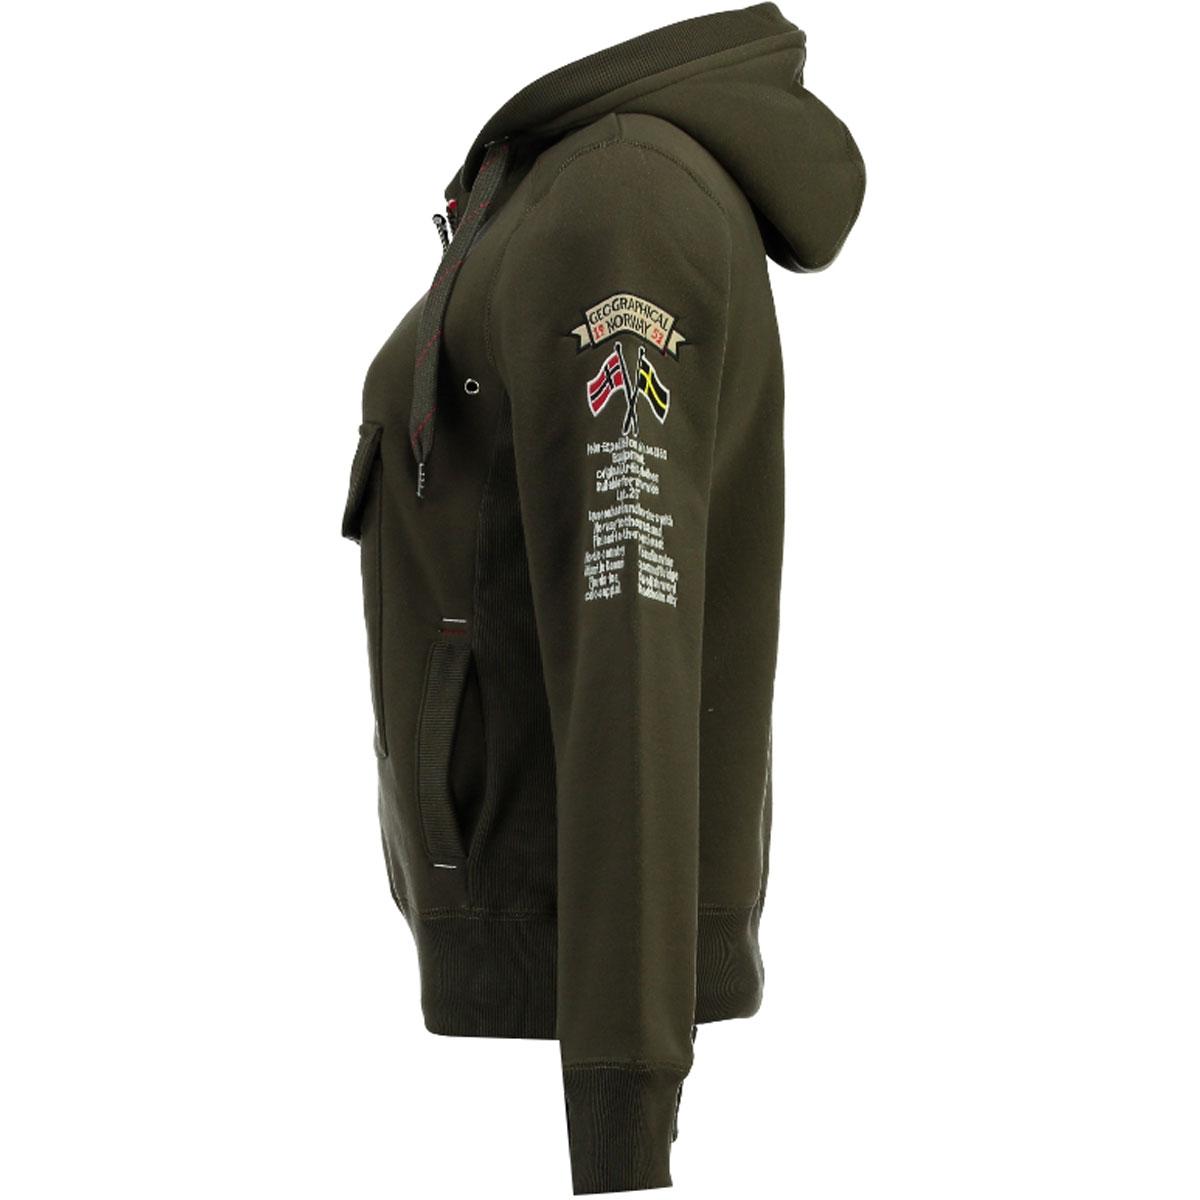 Geographical-Norway-giacca-uomo-autunno-inverno-S-fino-a-3xl-Felpa miniatura 10